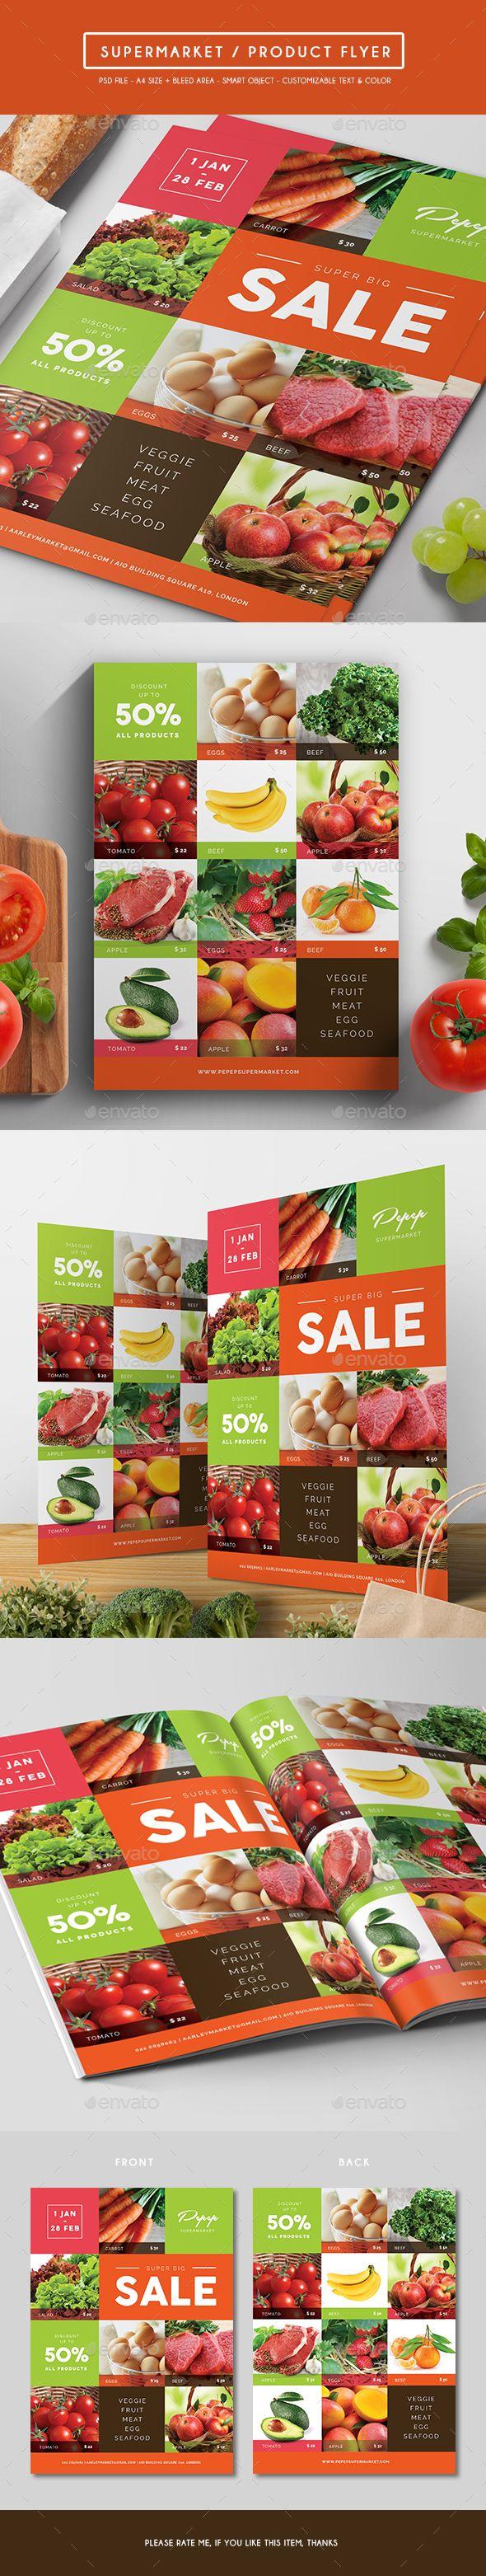 Supermarket / Product Flyer — Photoshop PSD #product promotion #sale • Avail...